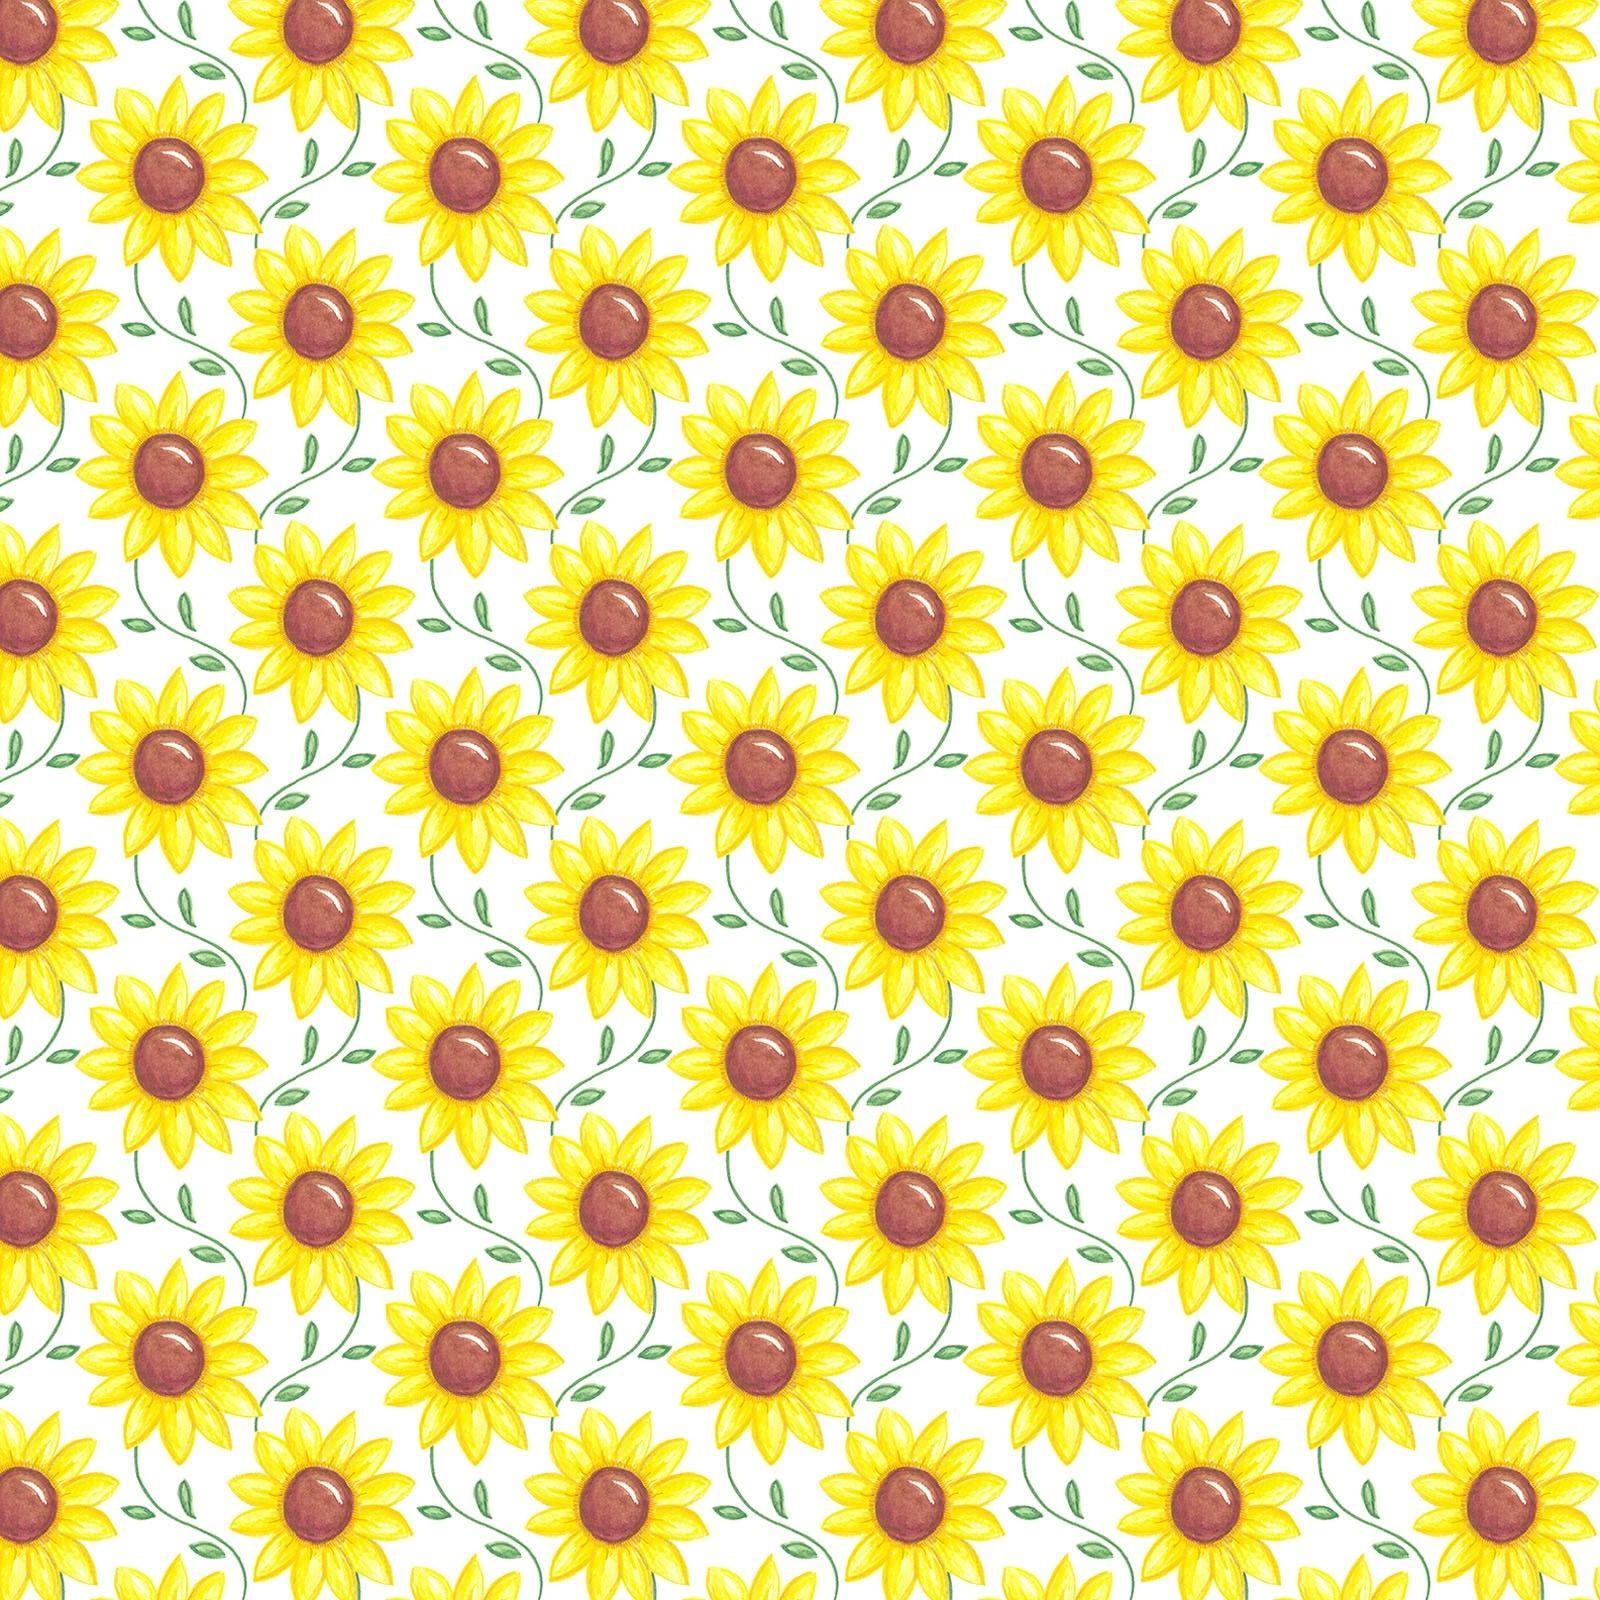 Scrolling Sunflowers White Rise N Shine Digital Print 100% Cotton